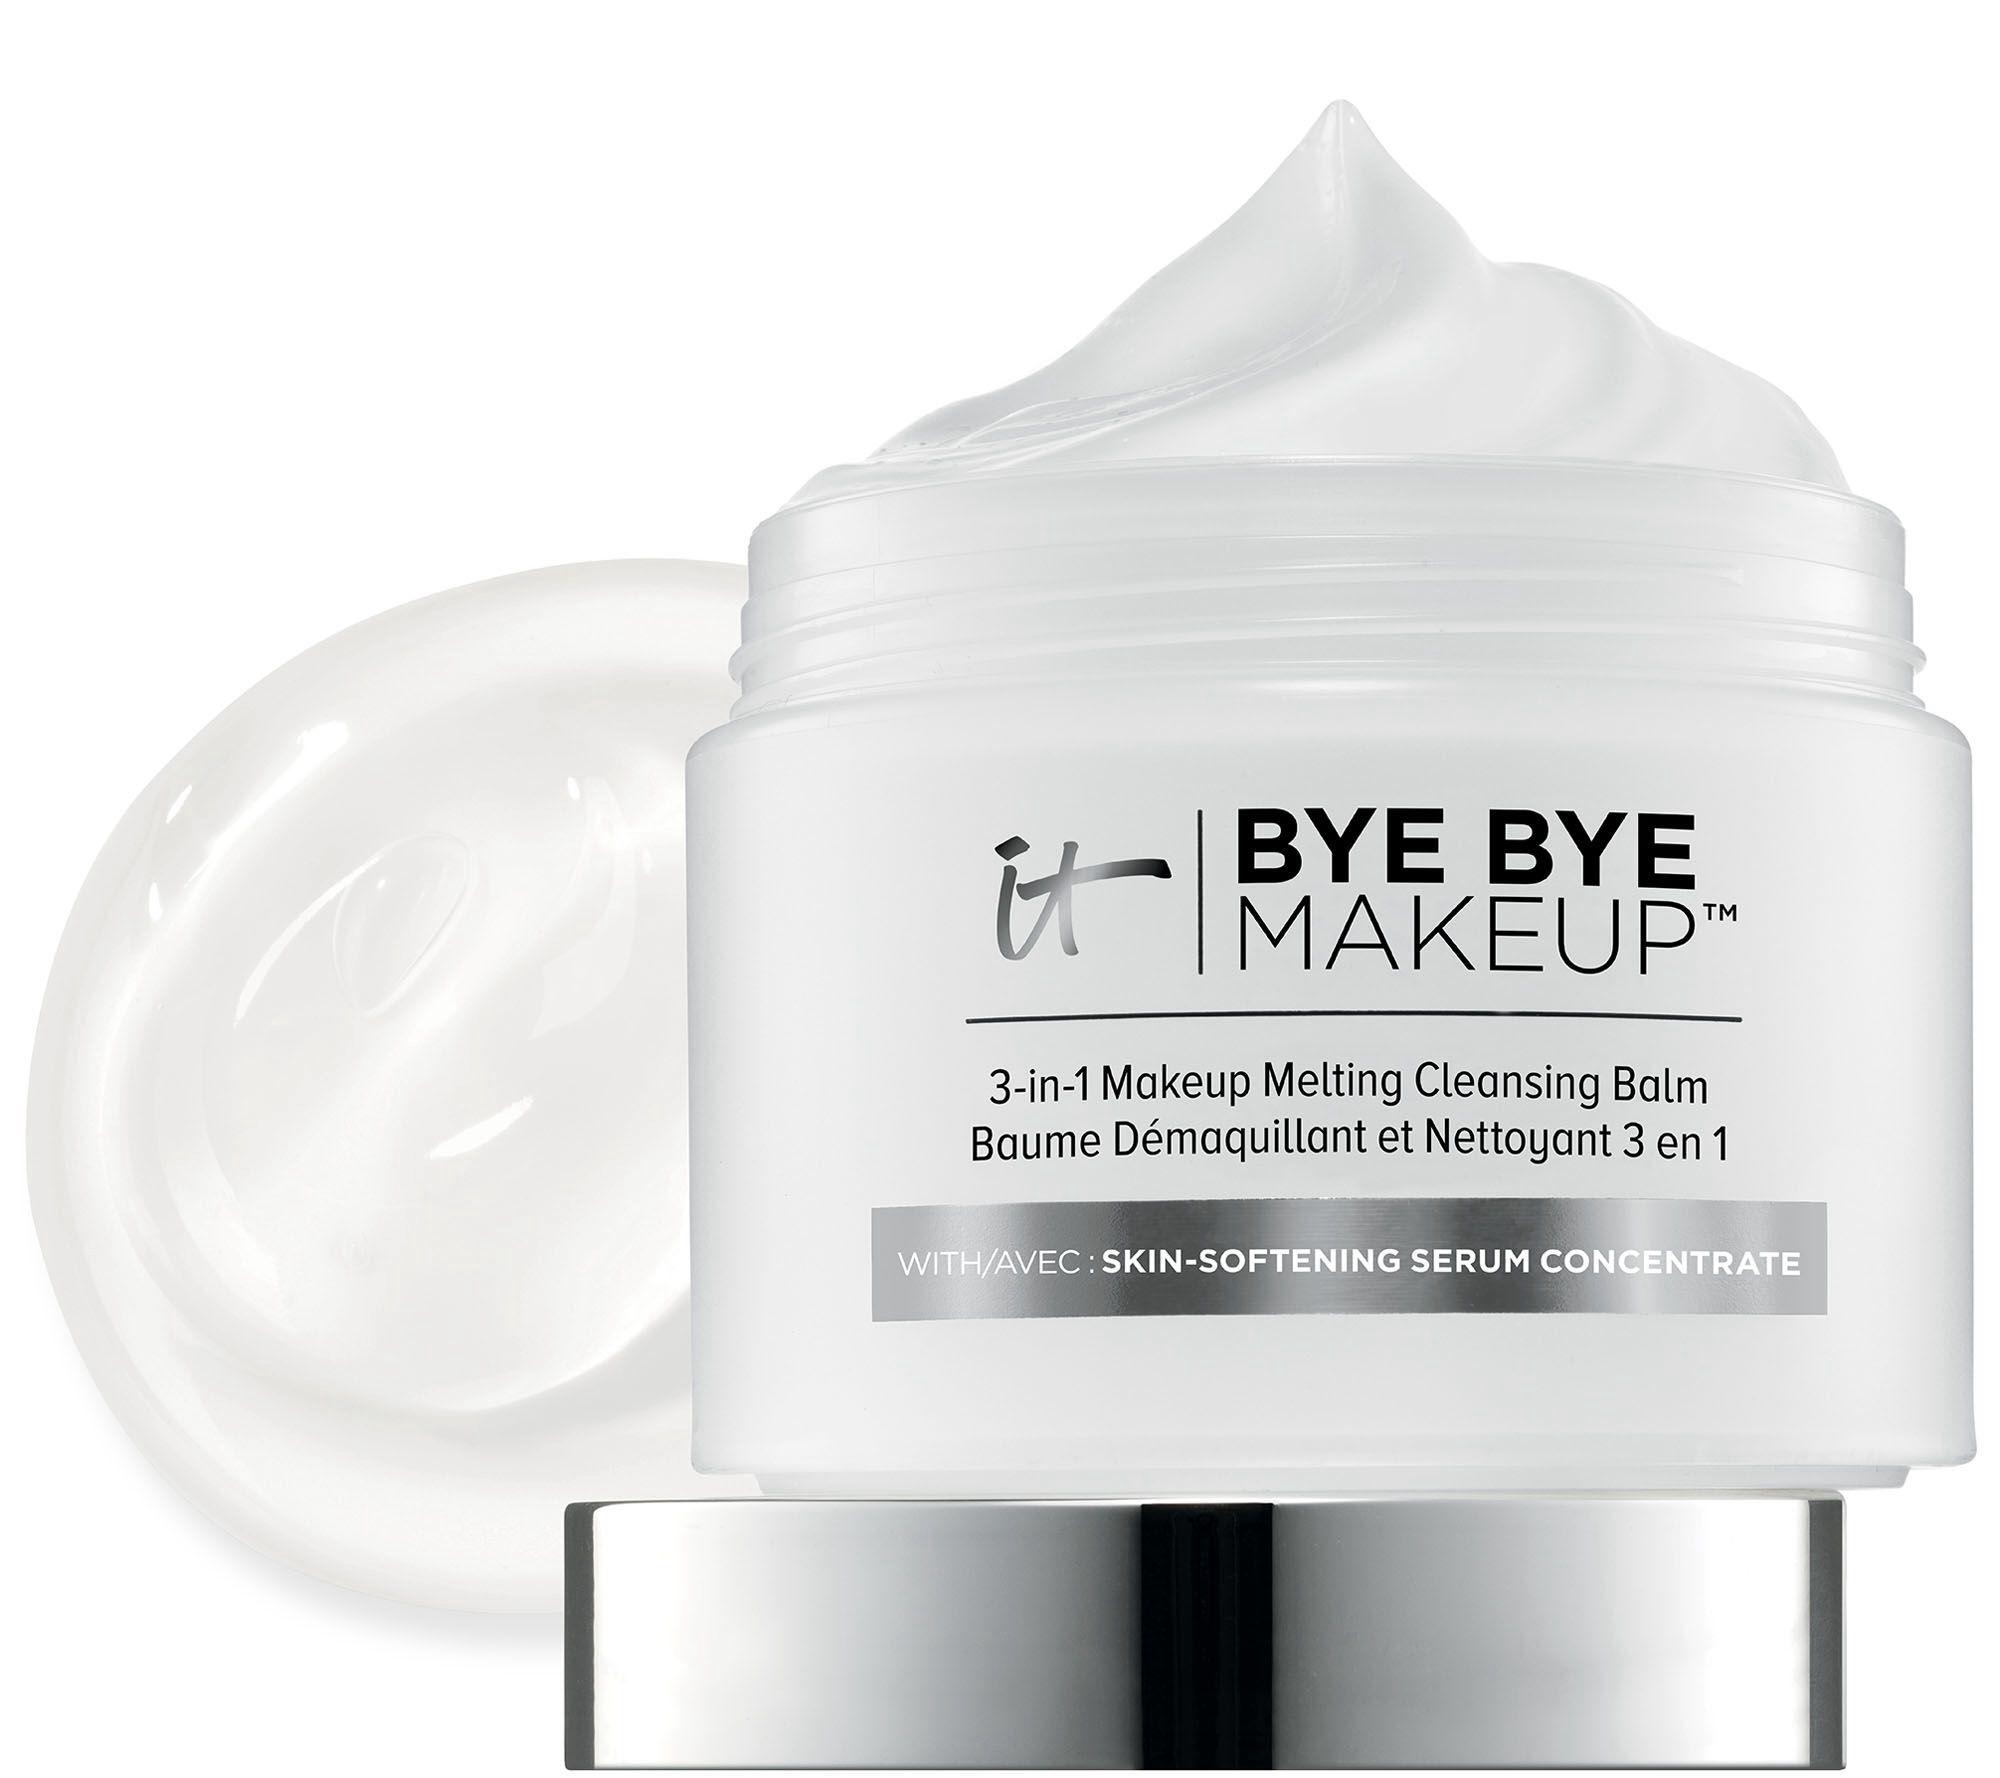 IT Cosmetics Bye Bye Makeup 3in1 Makeup Melting